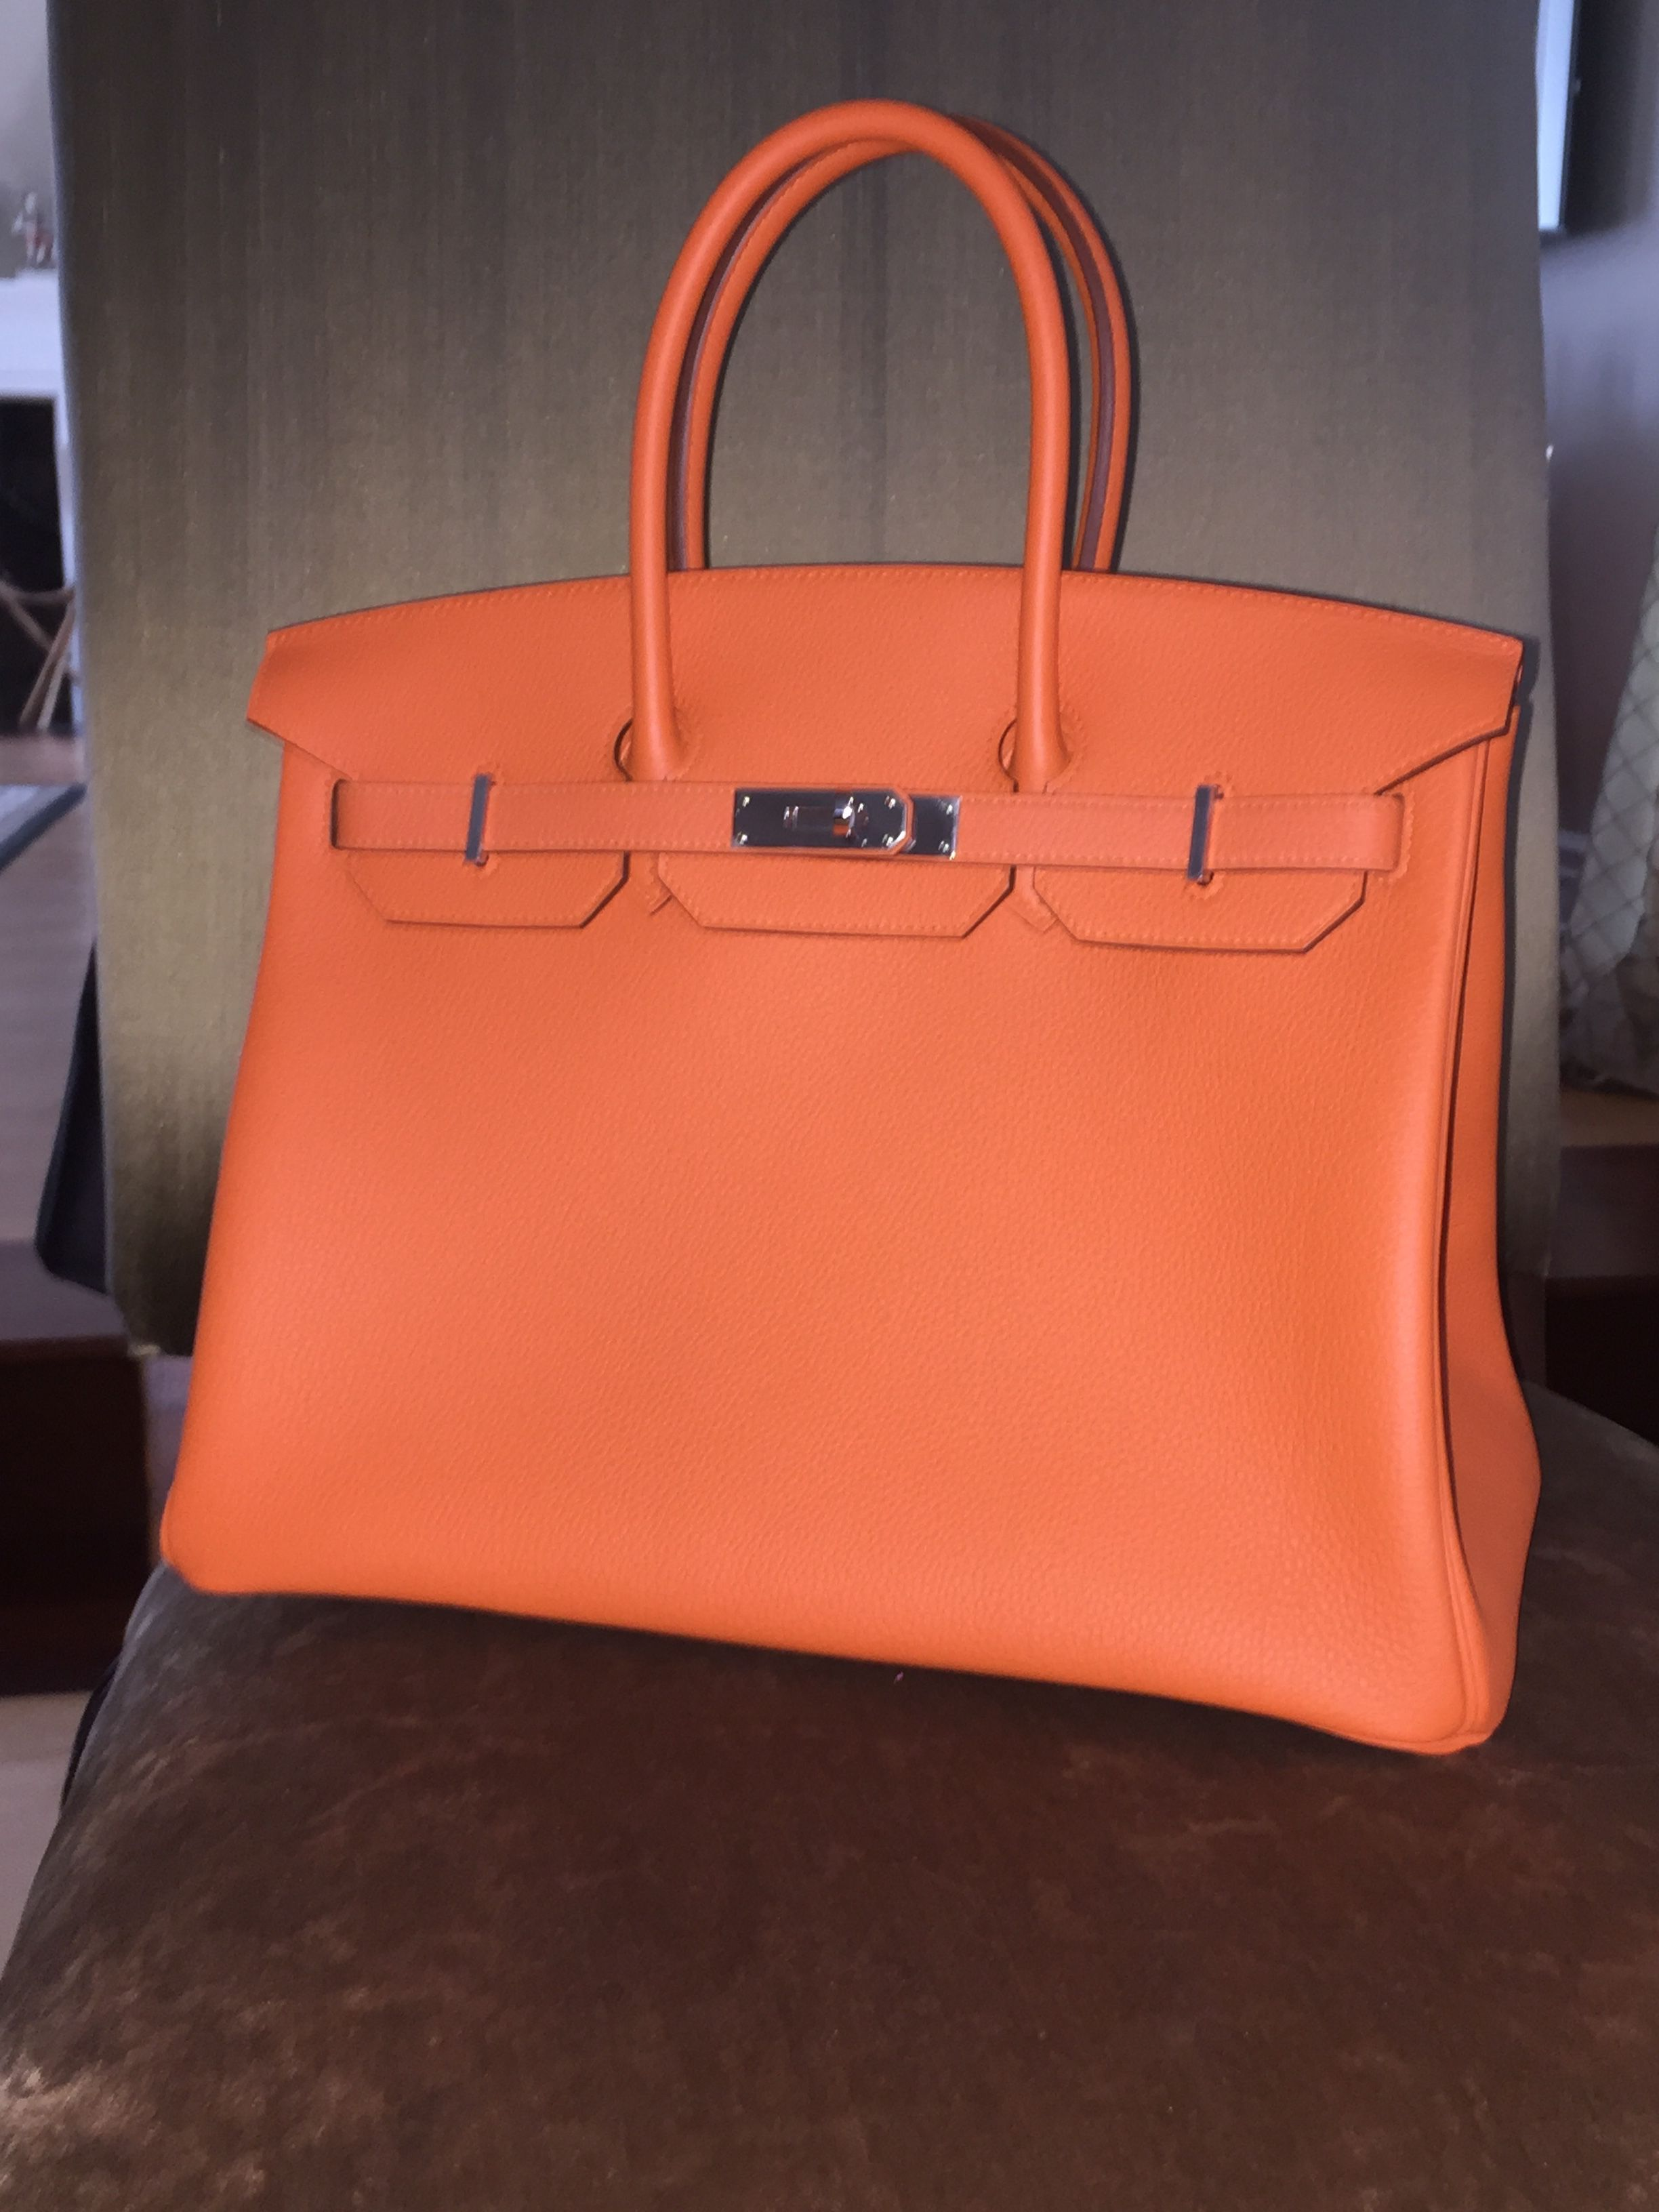 canada gread h35 hermes birkin 35cm tote bags granulate calf leather ... 522650e7c3b31